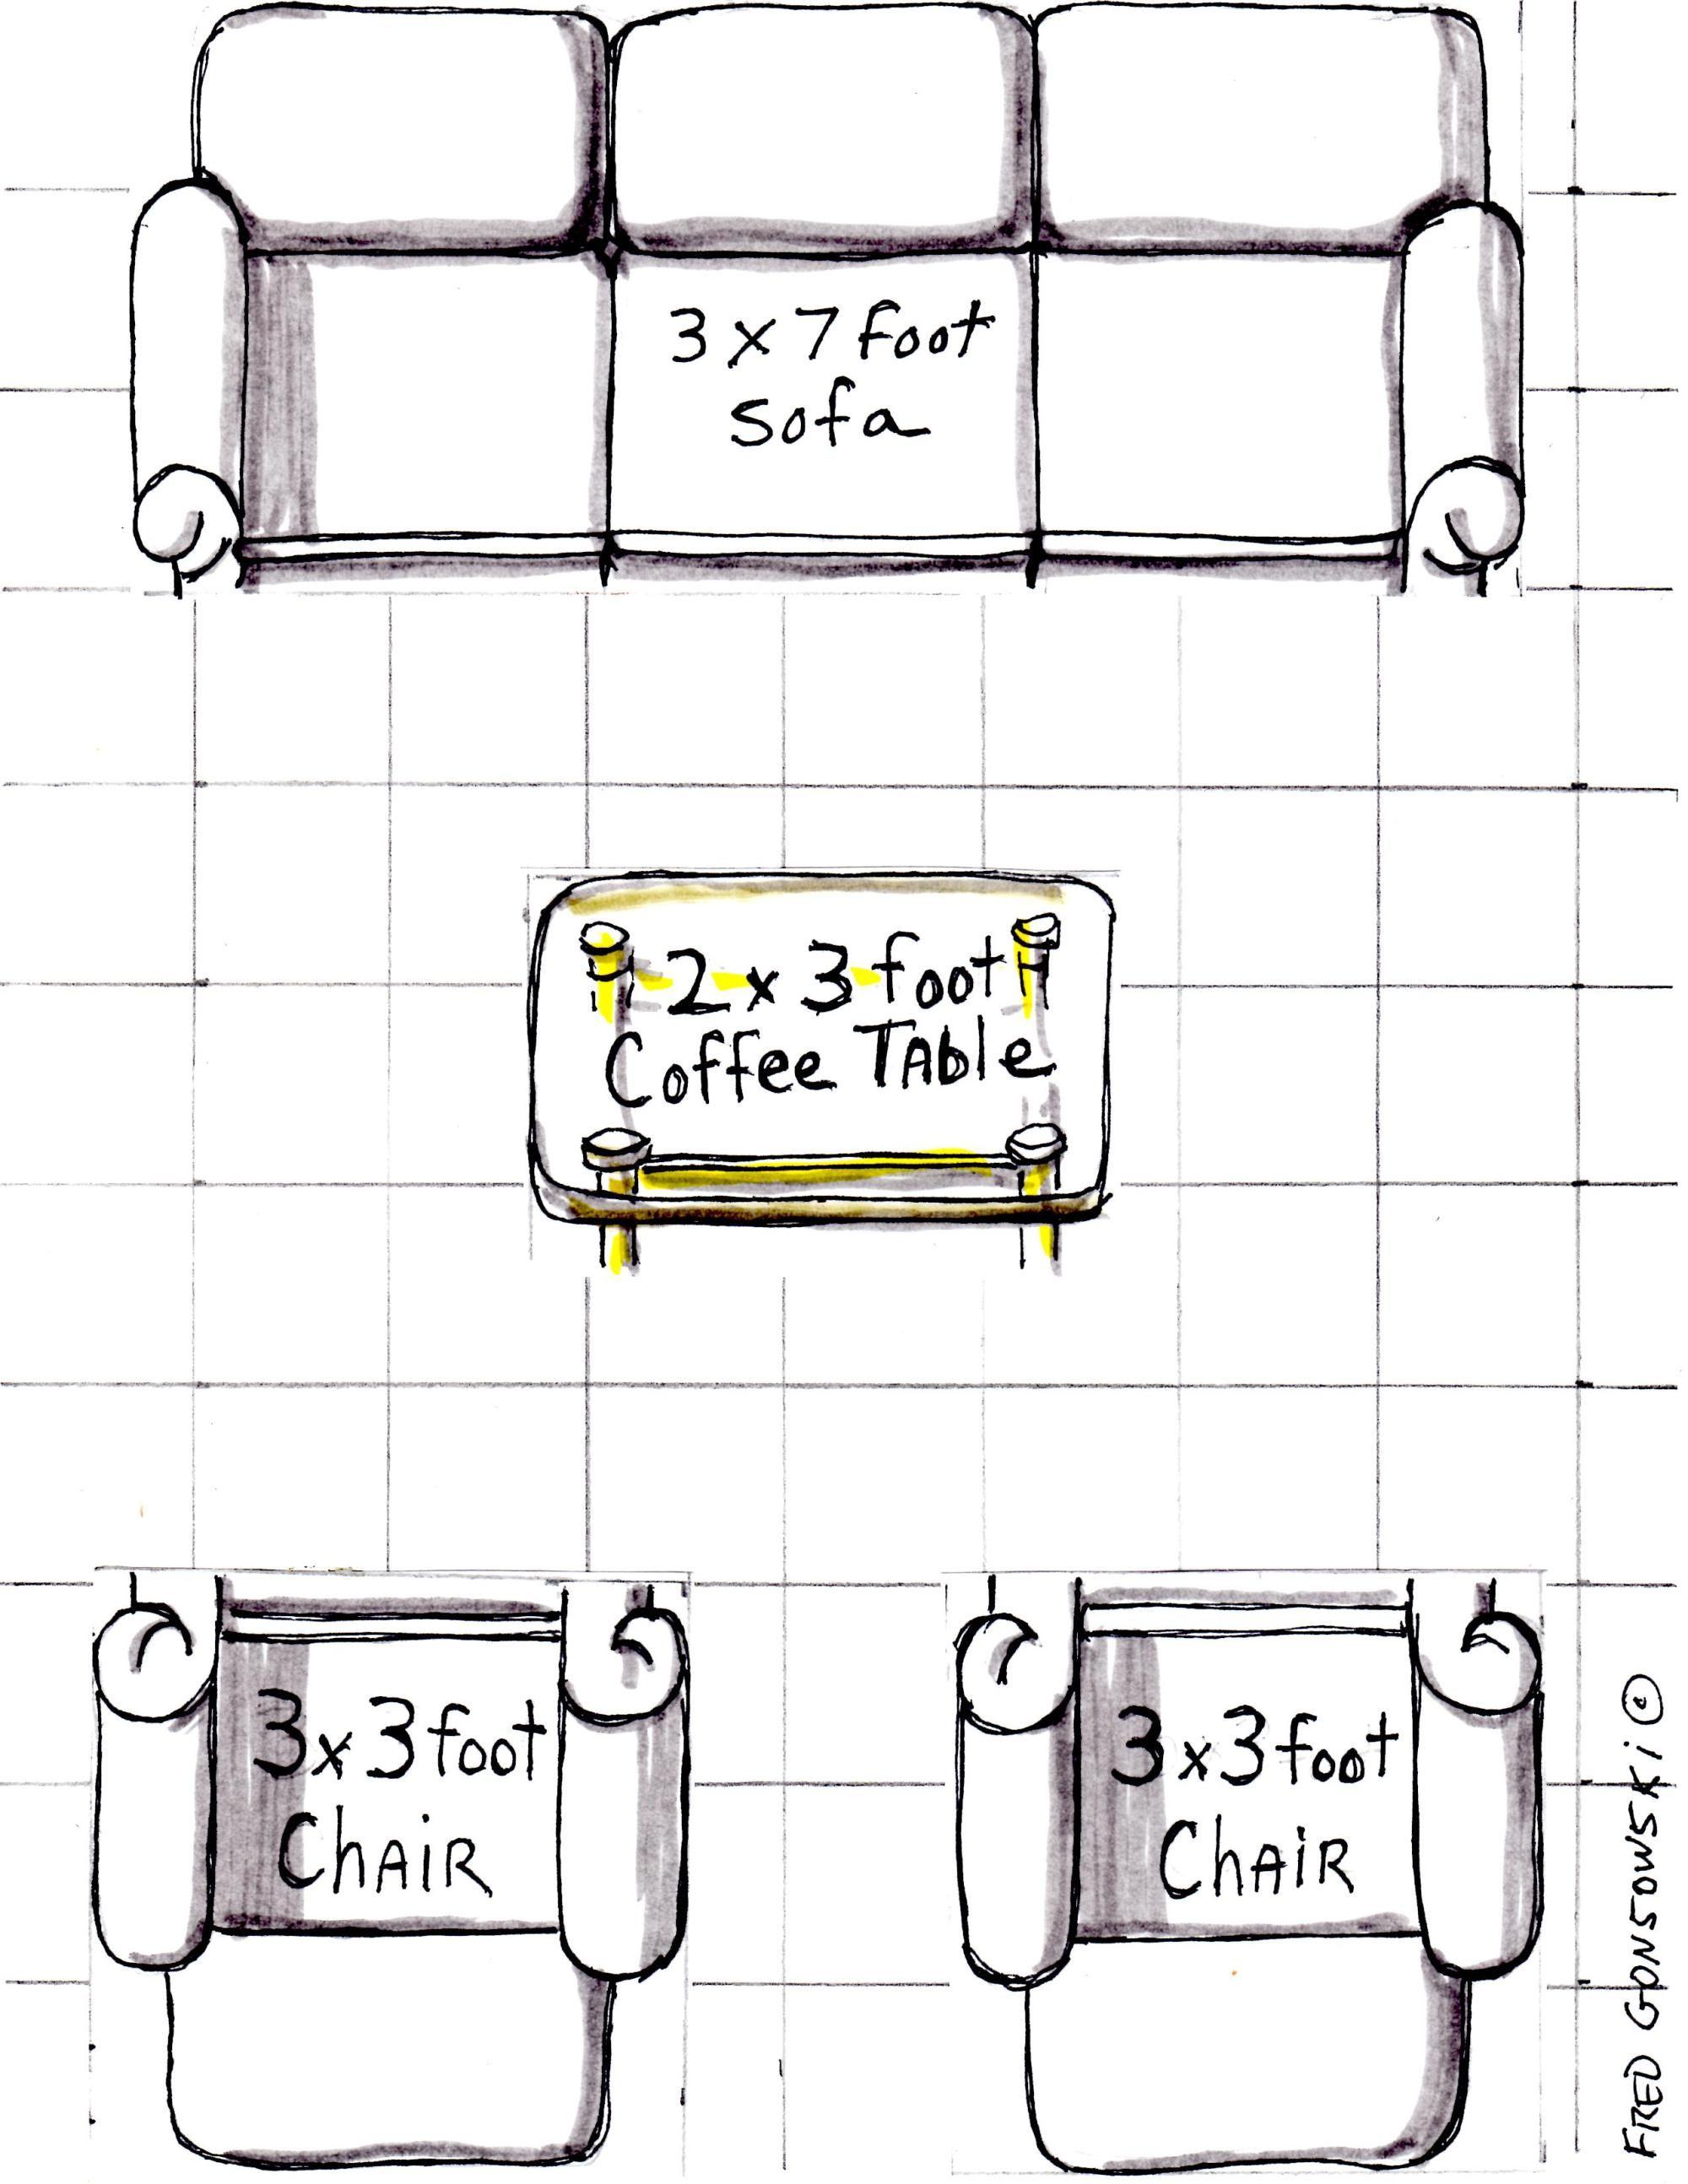 16x16 Master Bedroom Layout